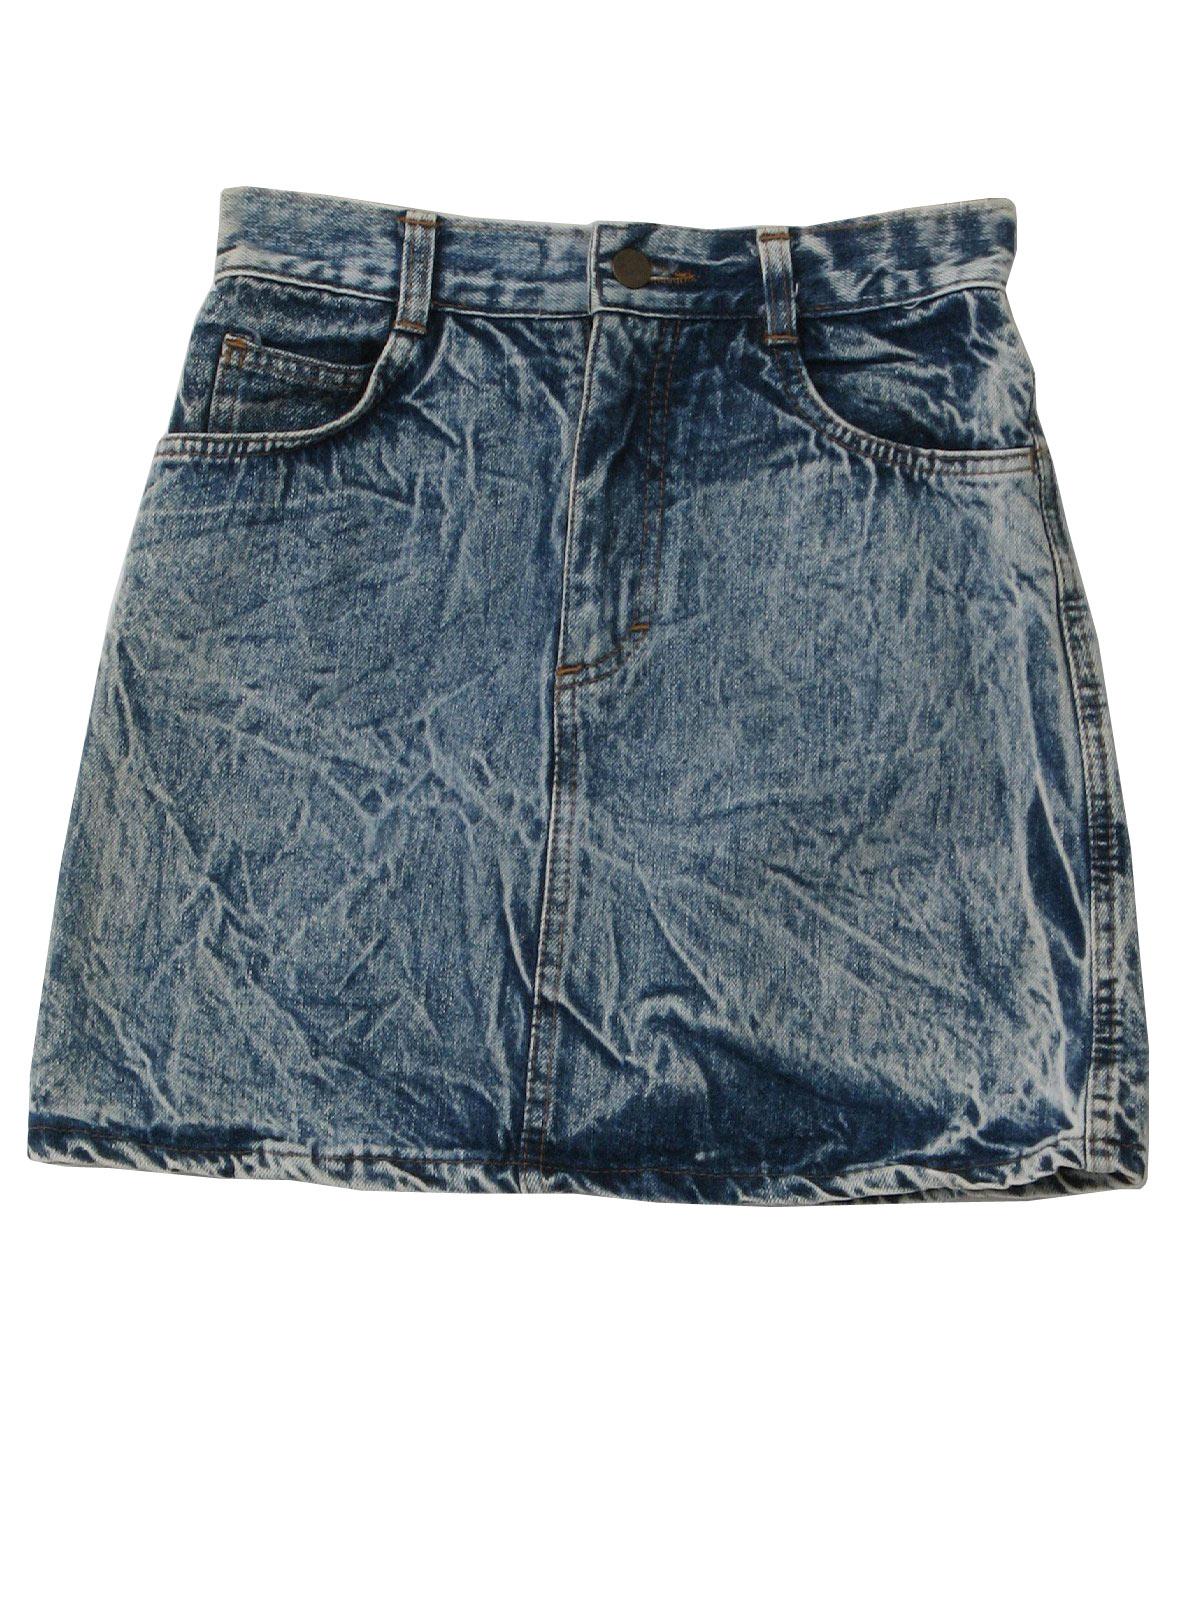 Retro 80s Mini Skirt Street Worn 80s Street Worn